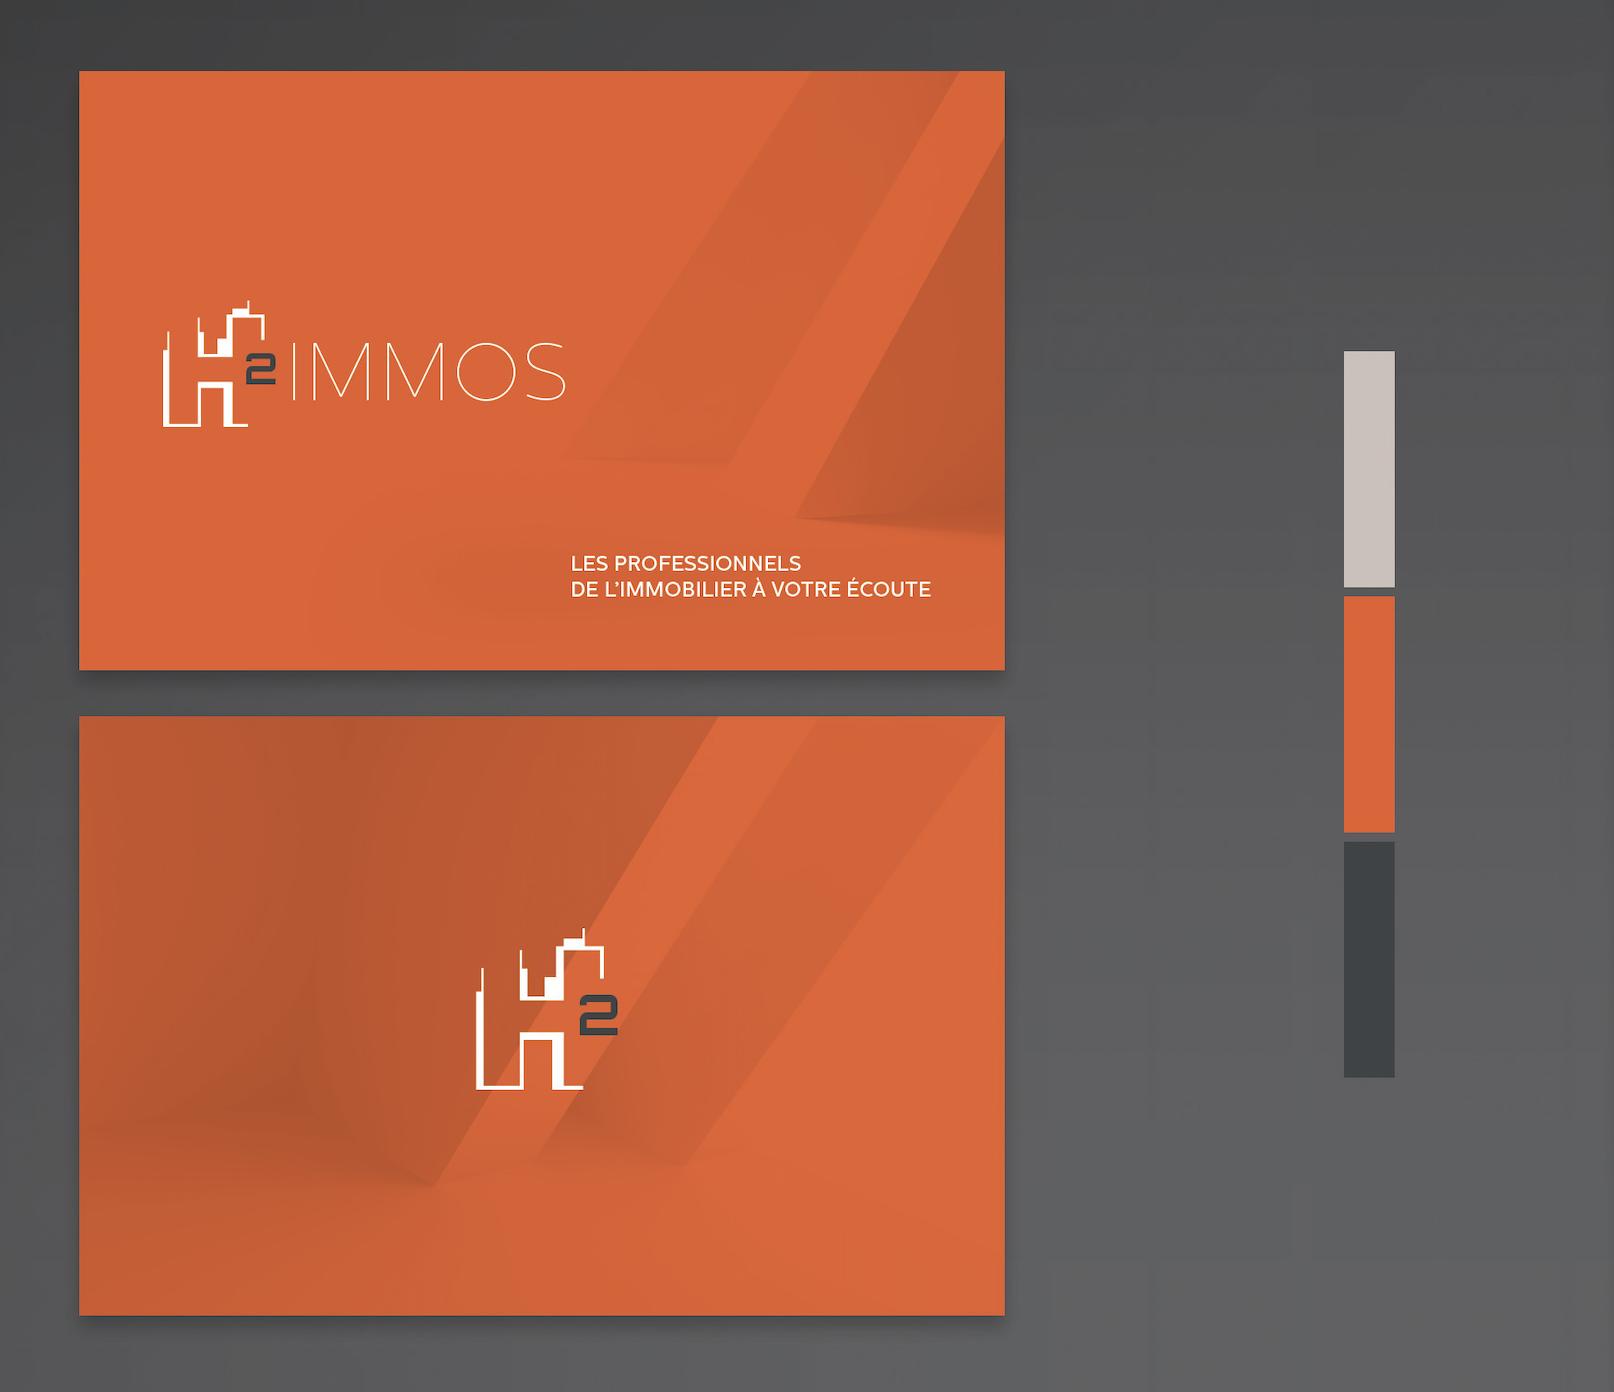 logo_H2_immos